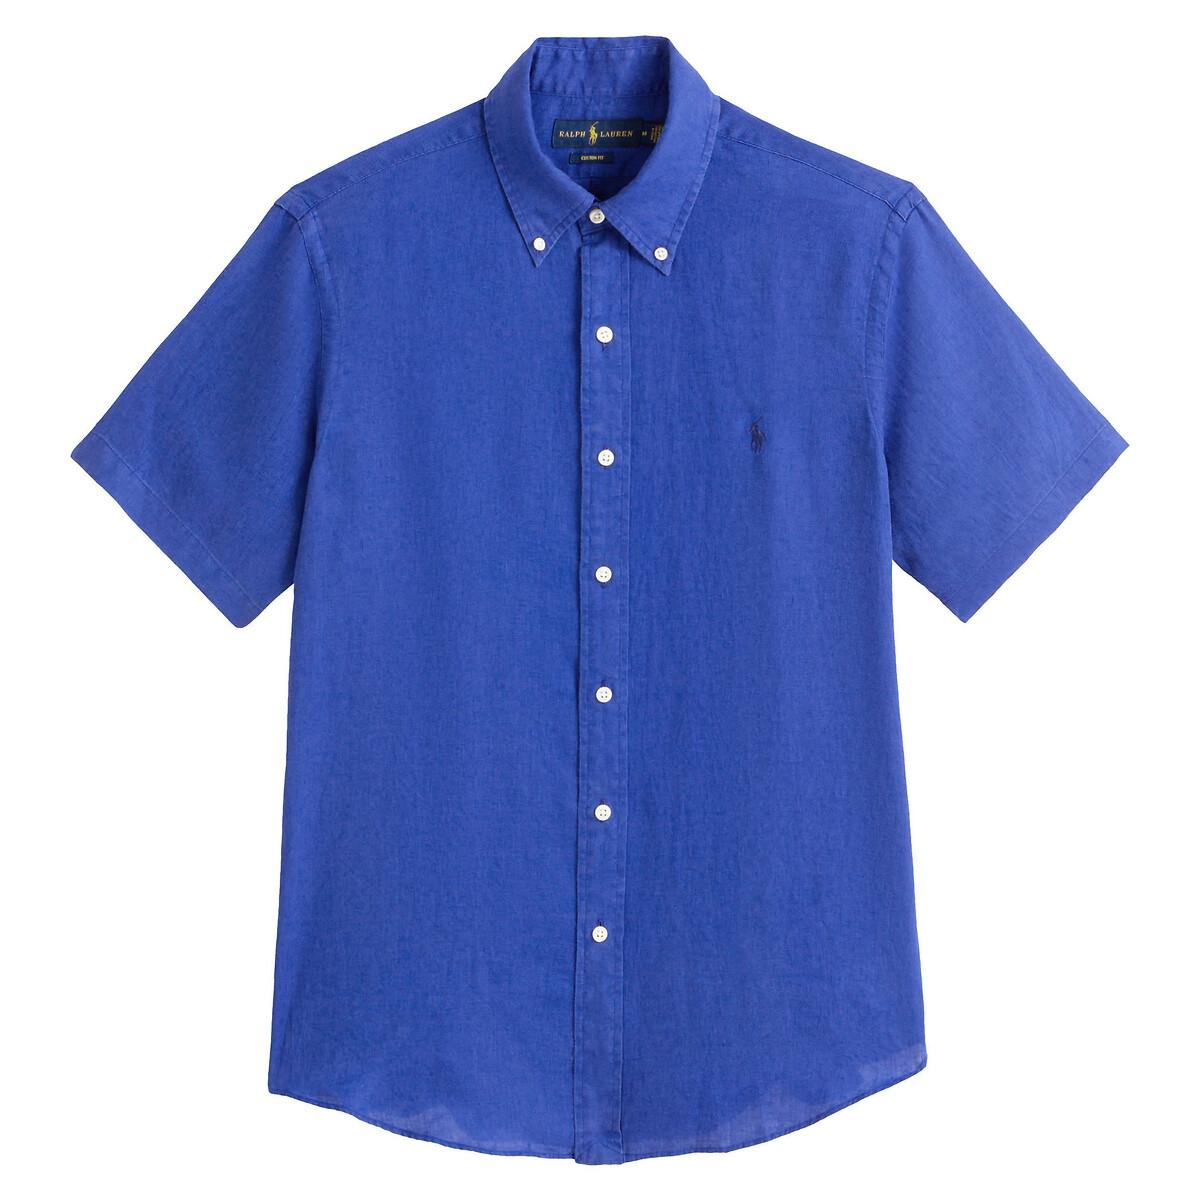 Рубашка La Redoute Прямого слегка зауженного покроя с короткими рукавами из льна M синий цена 2017